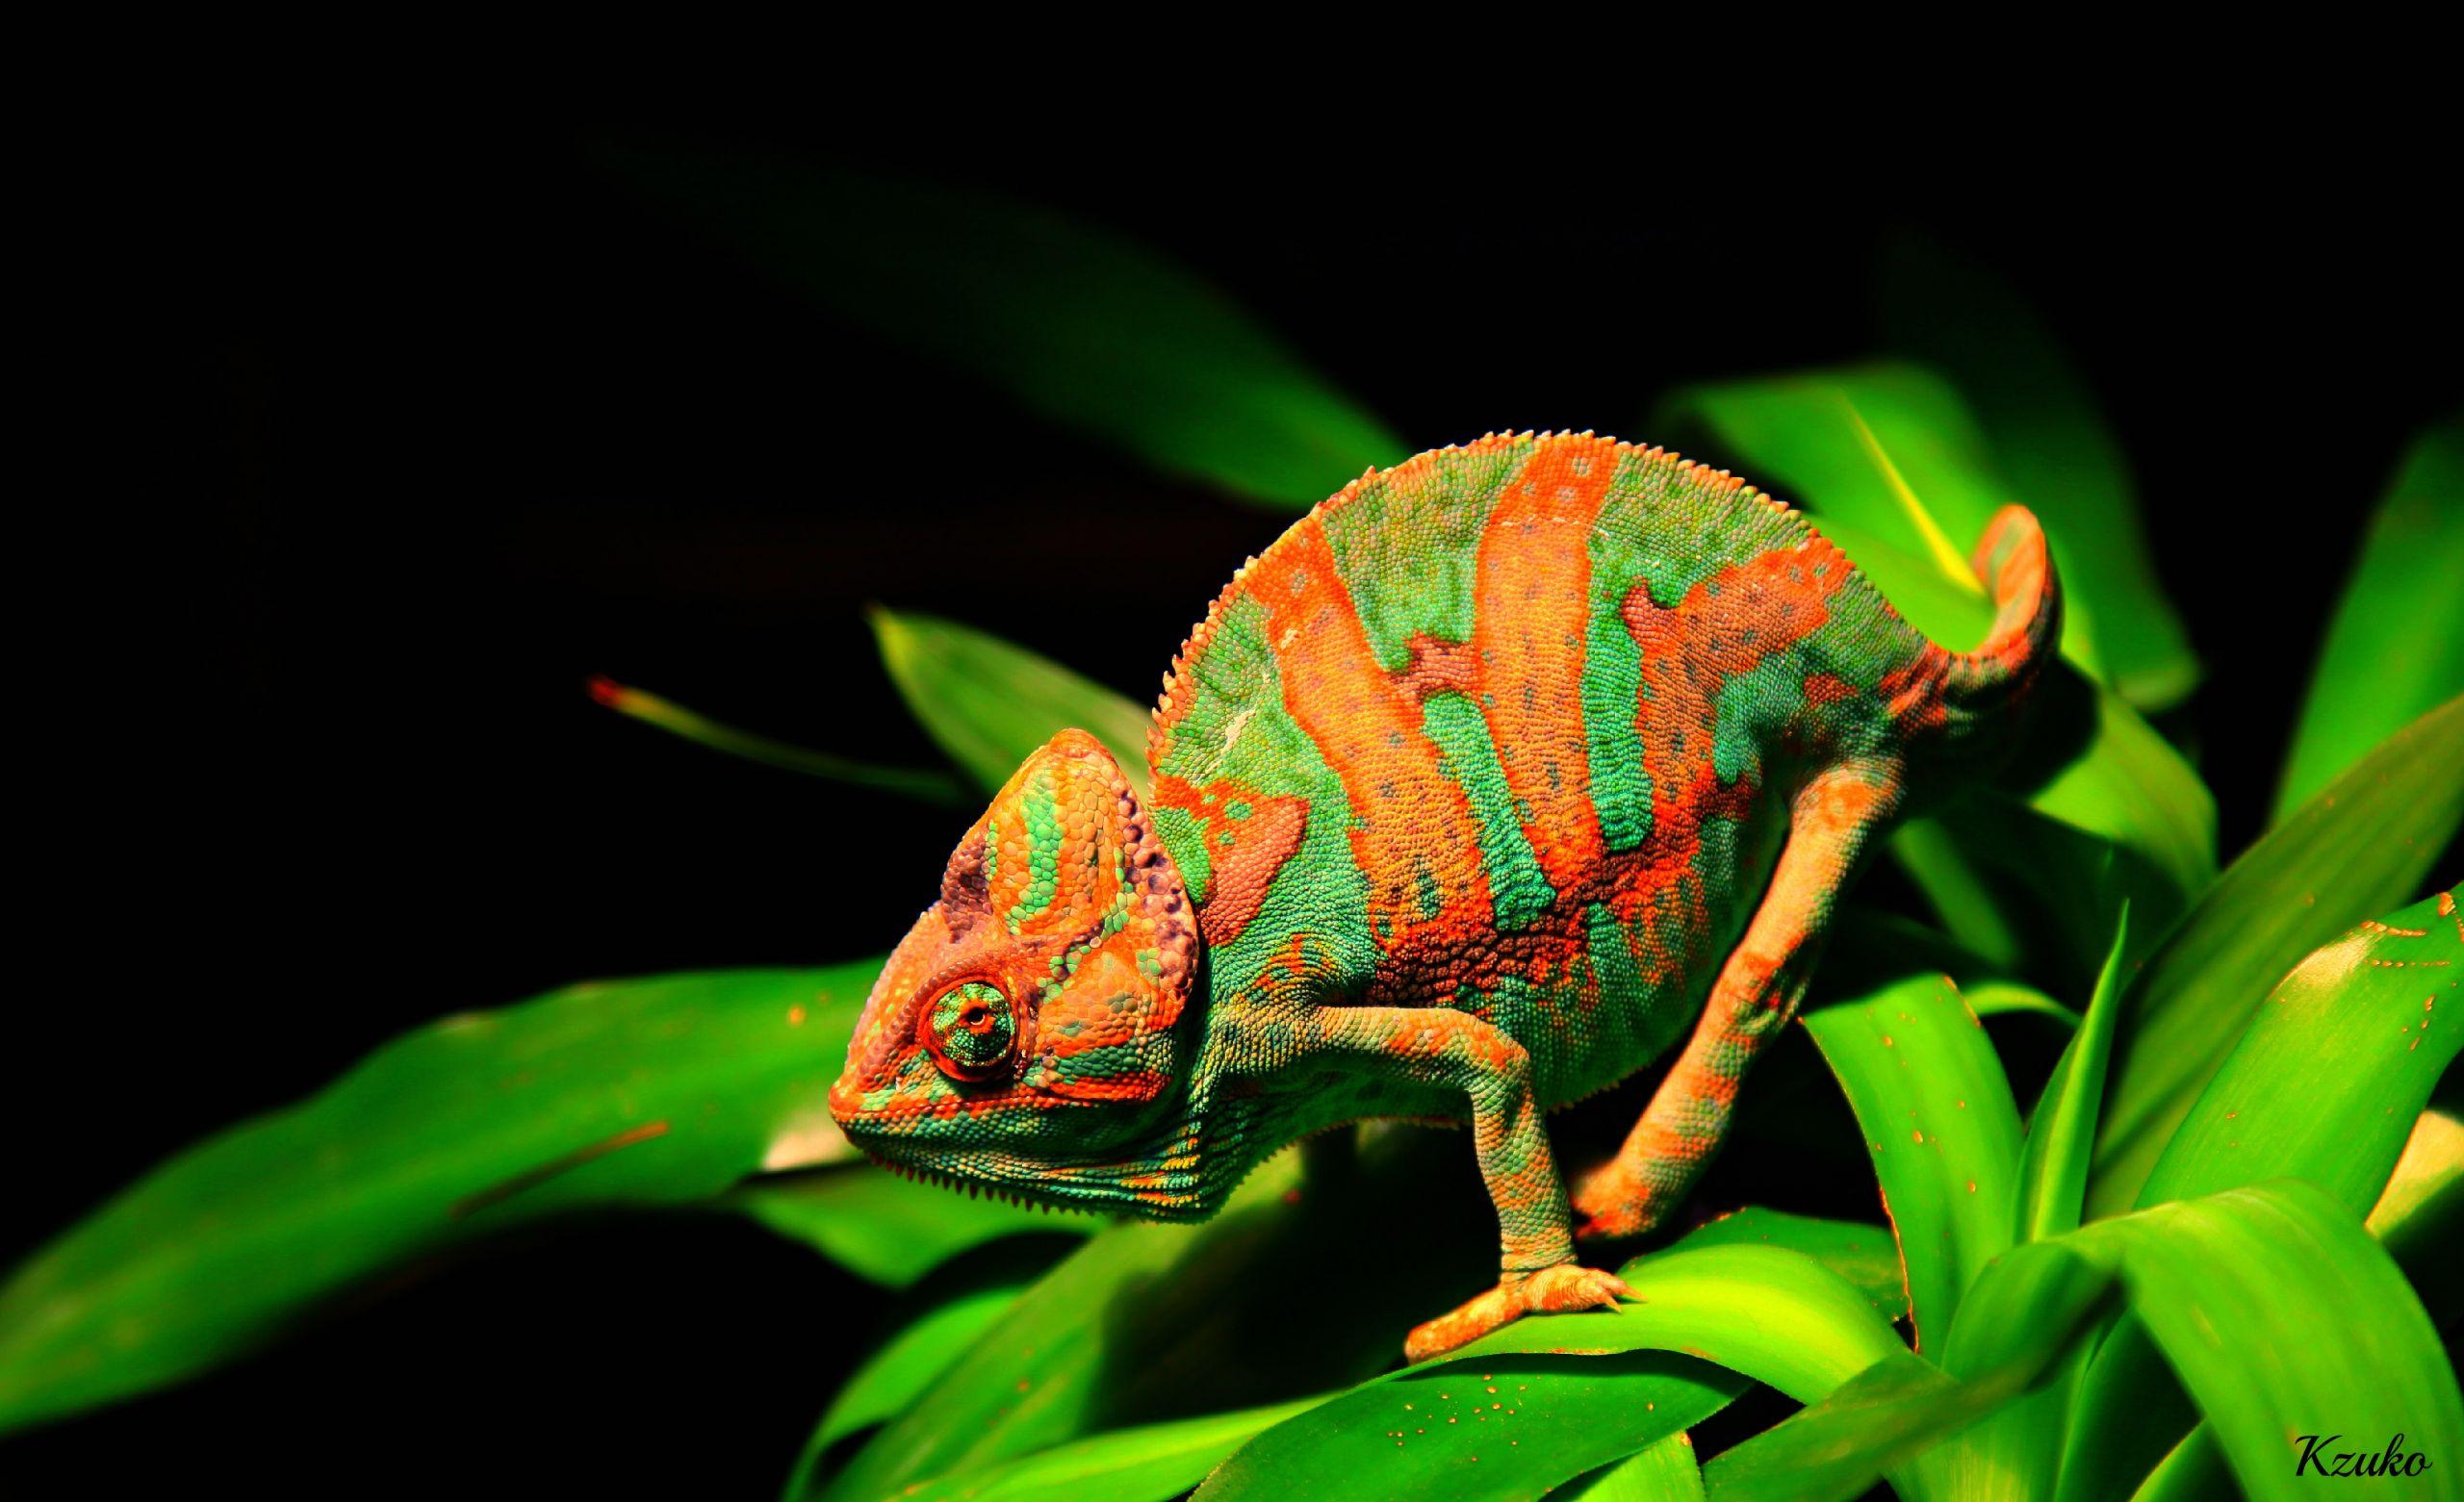 Wallpapers Animals Chameleons Rango